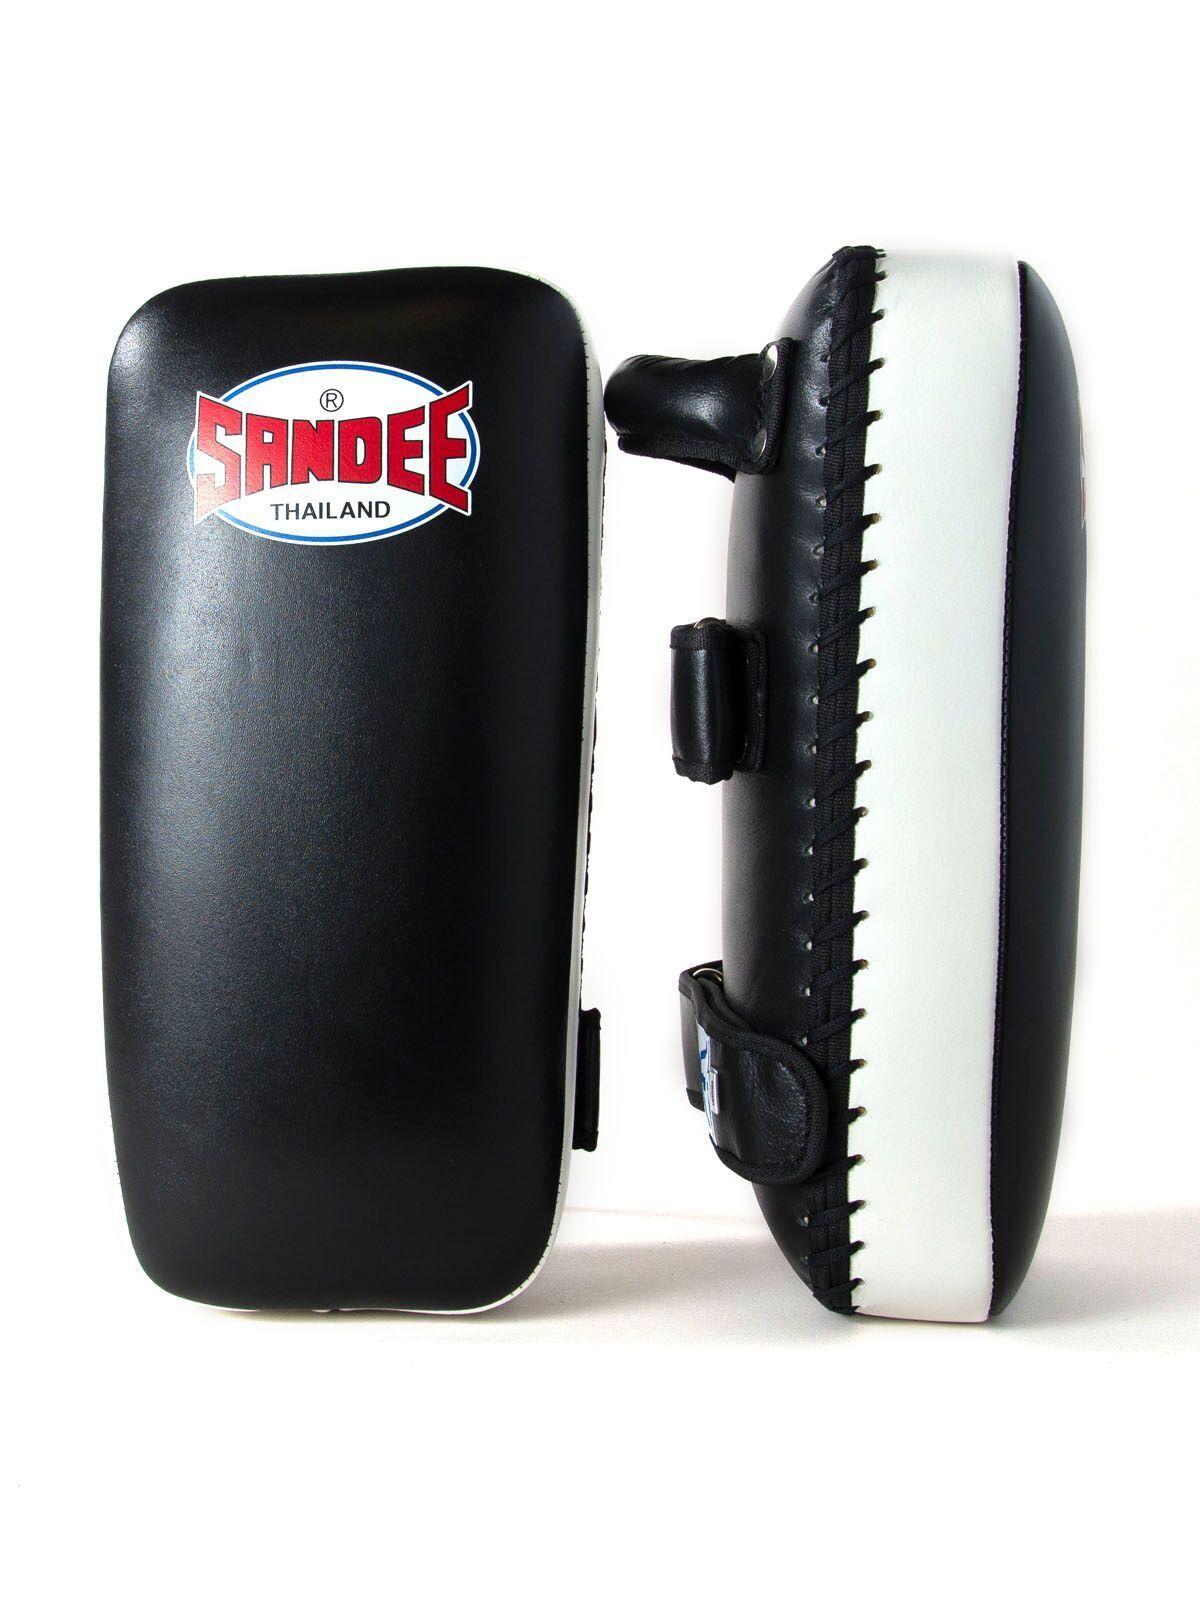 SeEE MUAY THAI Kick pad piatto Focus Pads Strike Shield Kickscatolaing Pugilato Nero